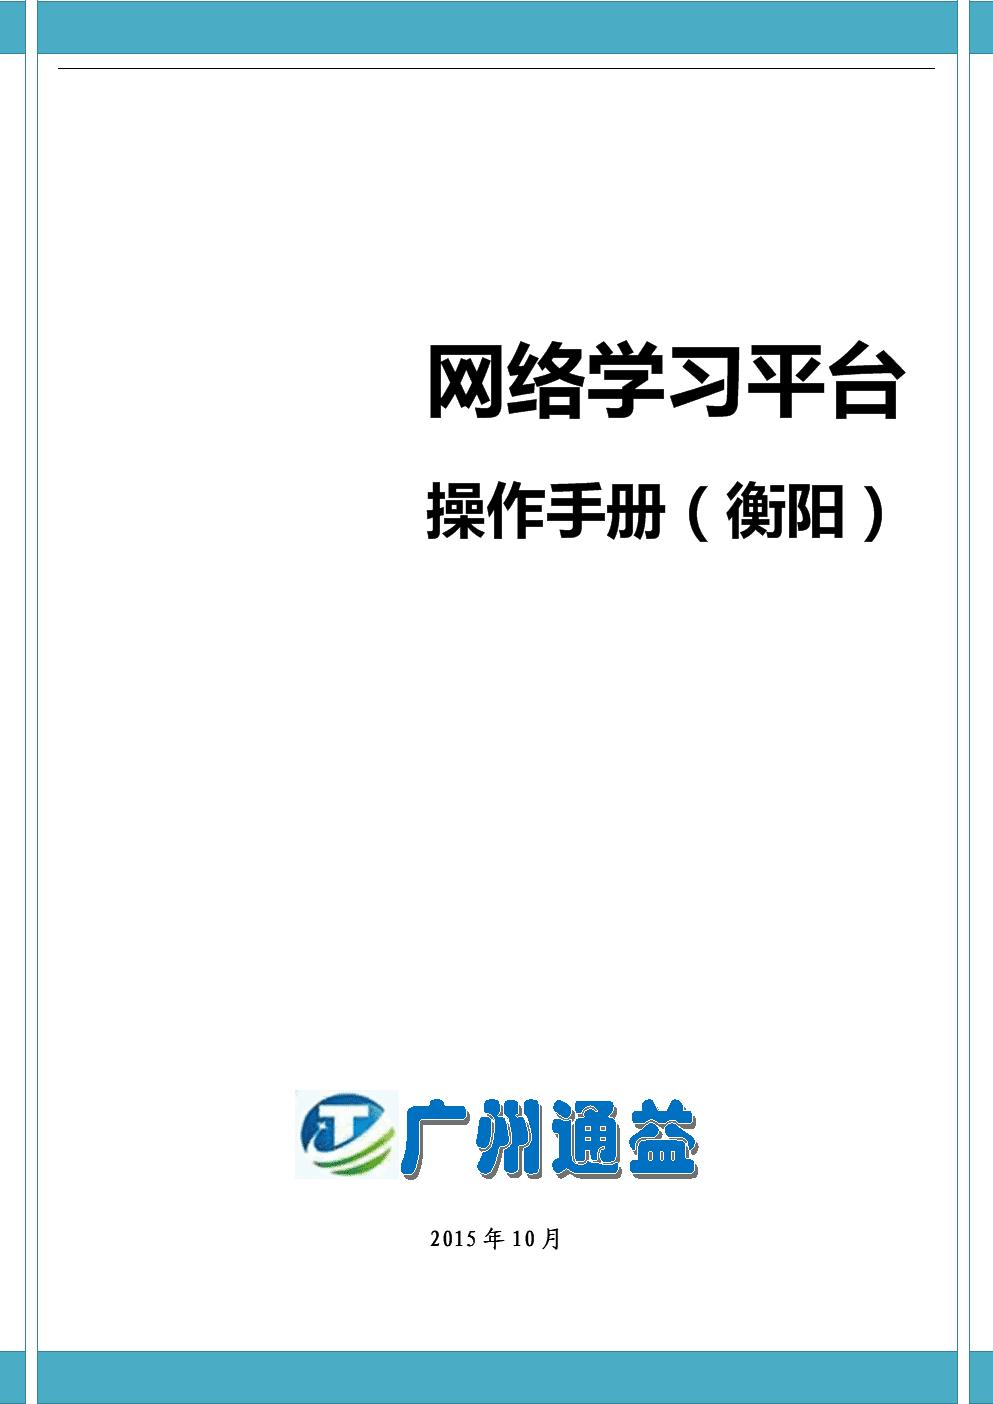 网络学习平台.docx